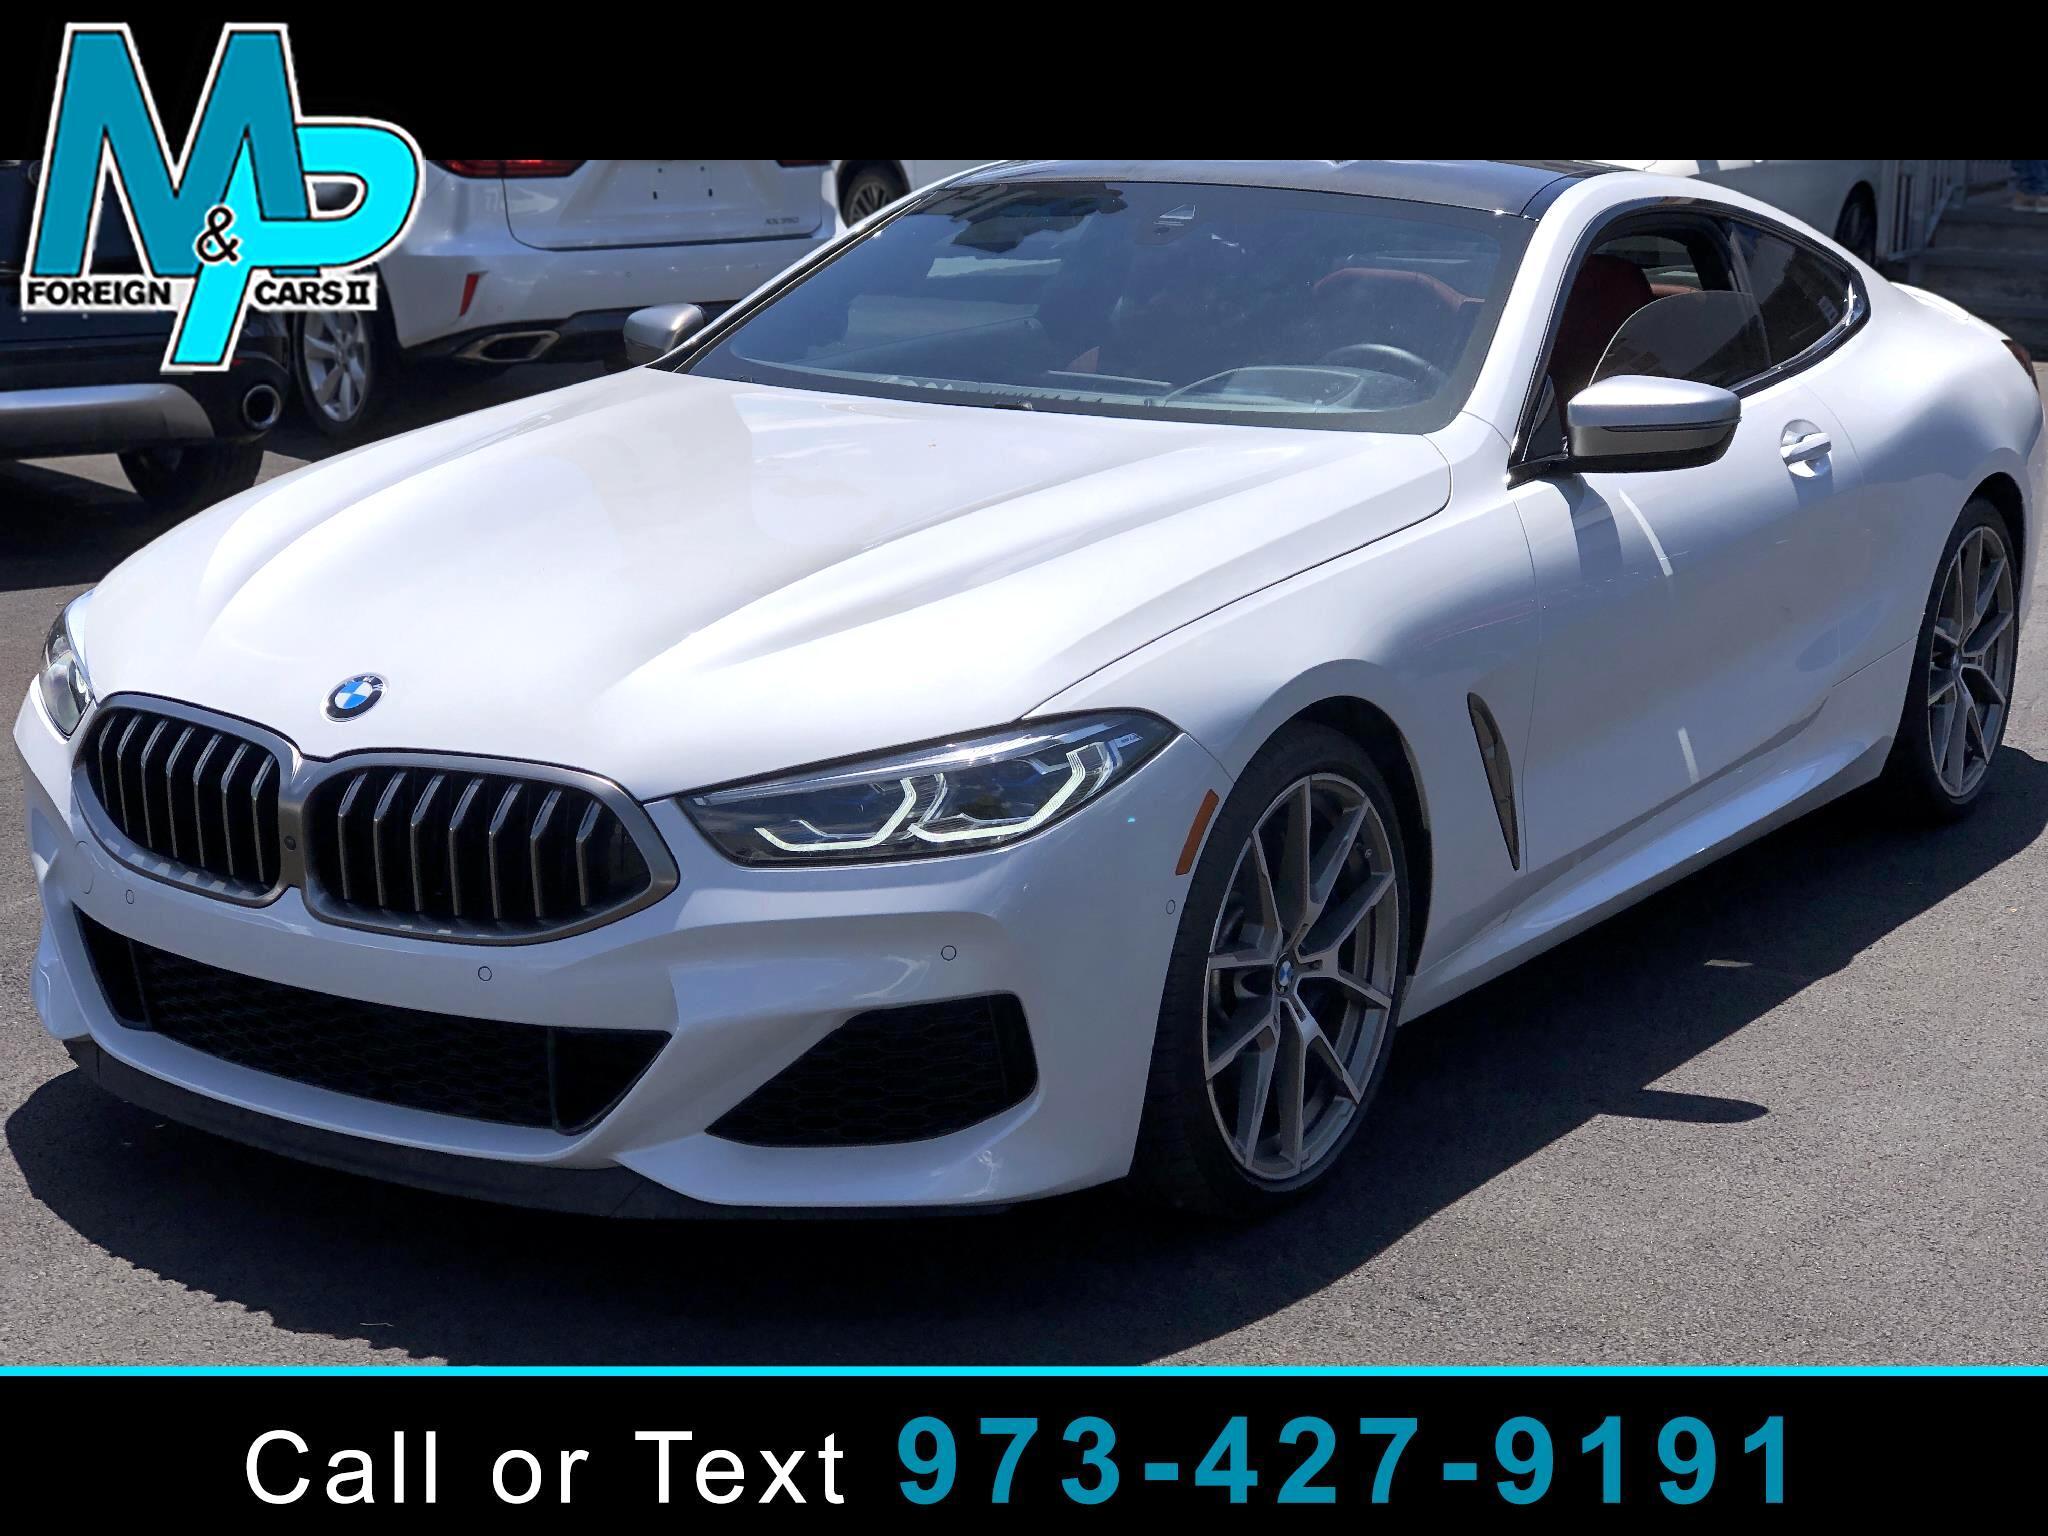 BMW 8 Series M850i xDrive Coupe 2019